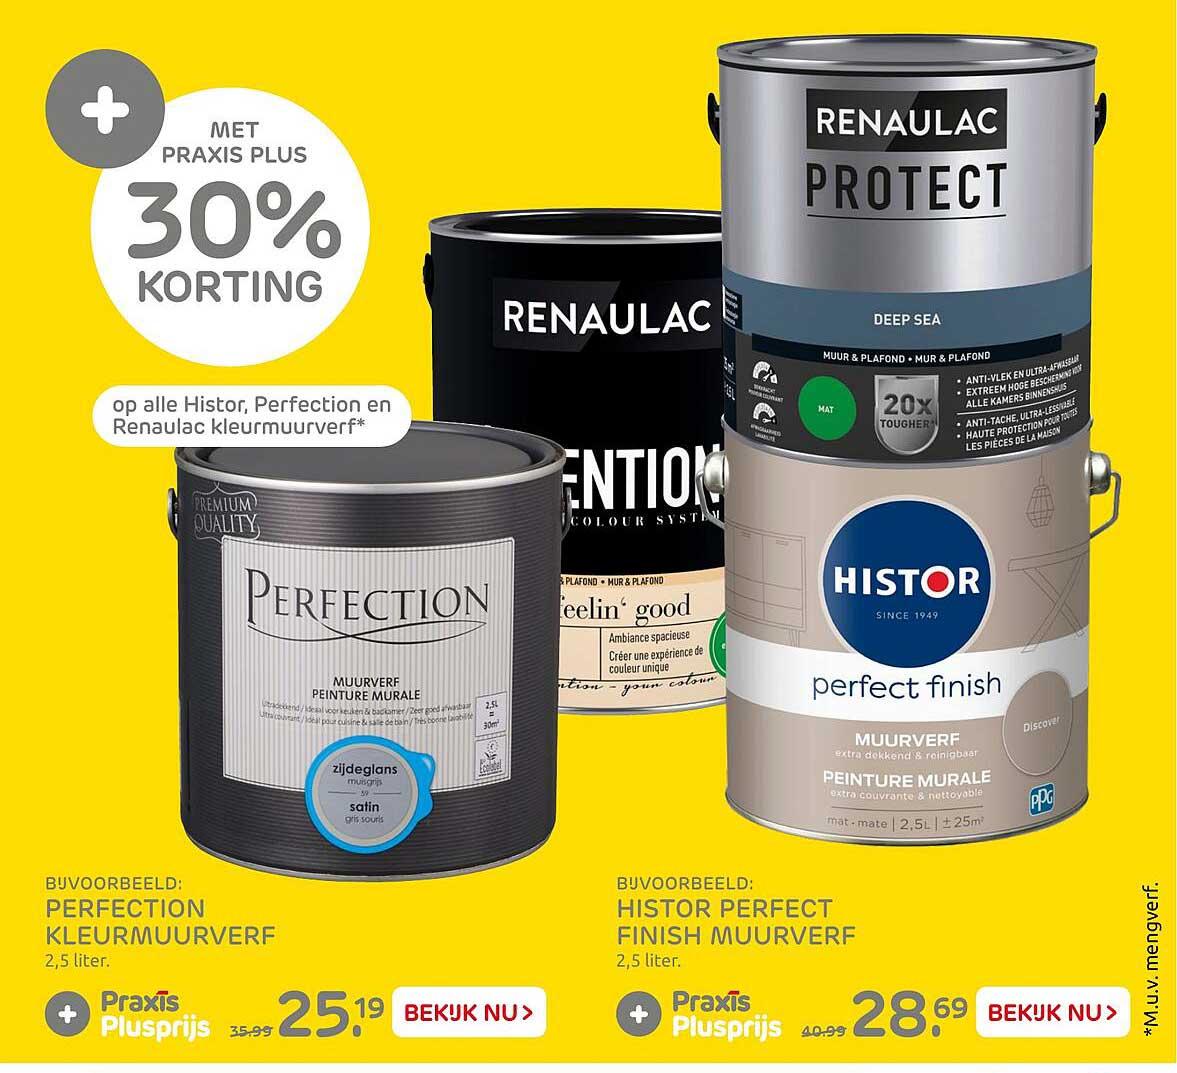 Praxis Perfection Kleurmuurverf Of Histor Perfect Finish Muurverf 30% Korting